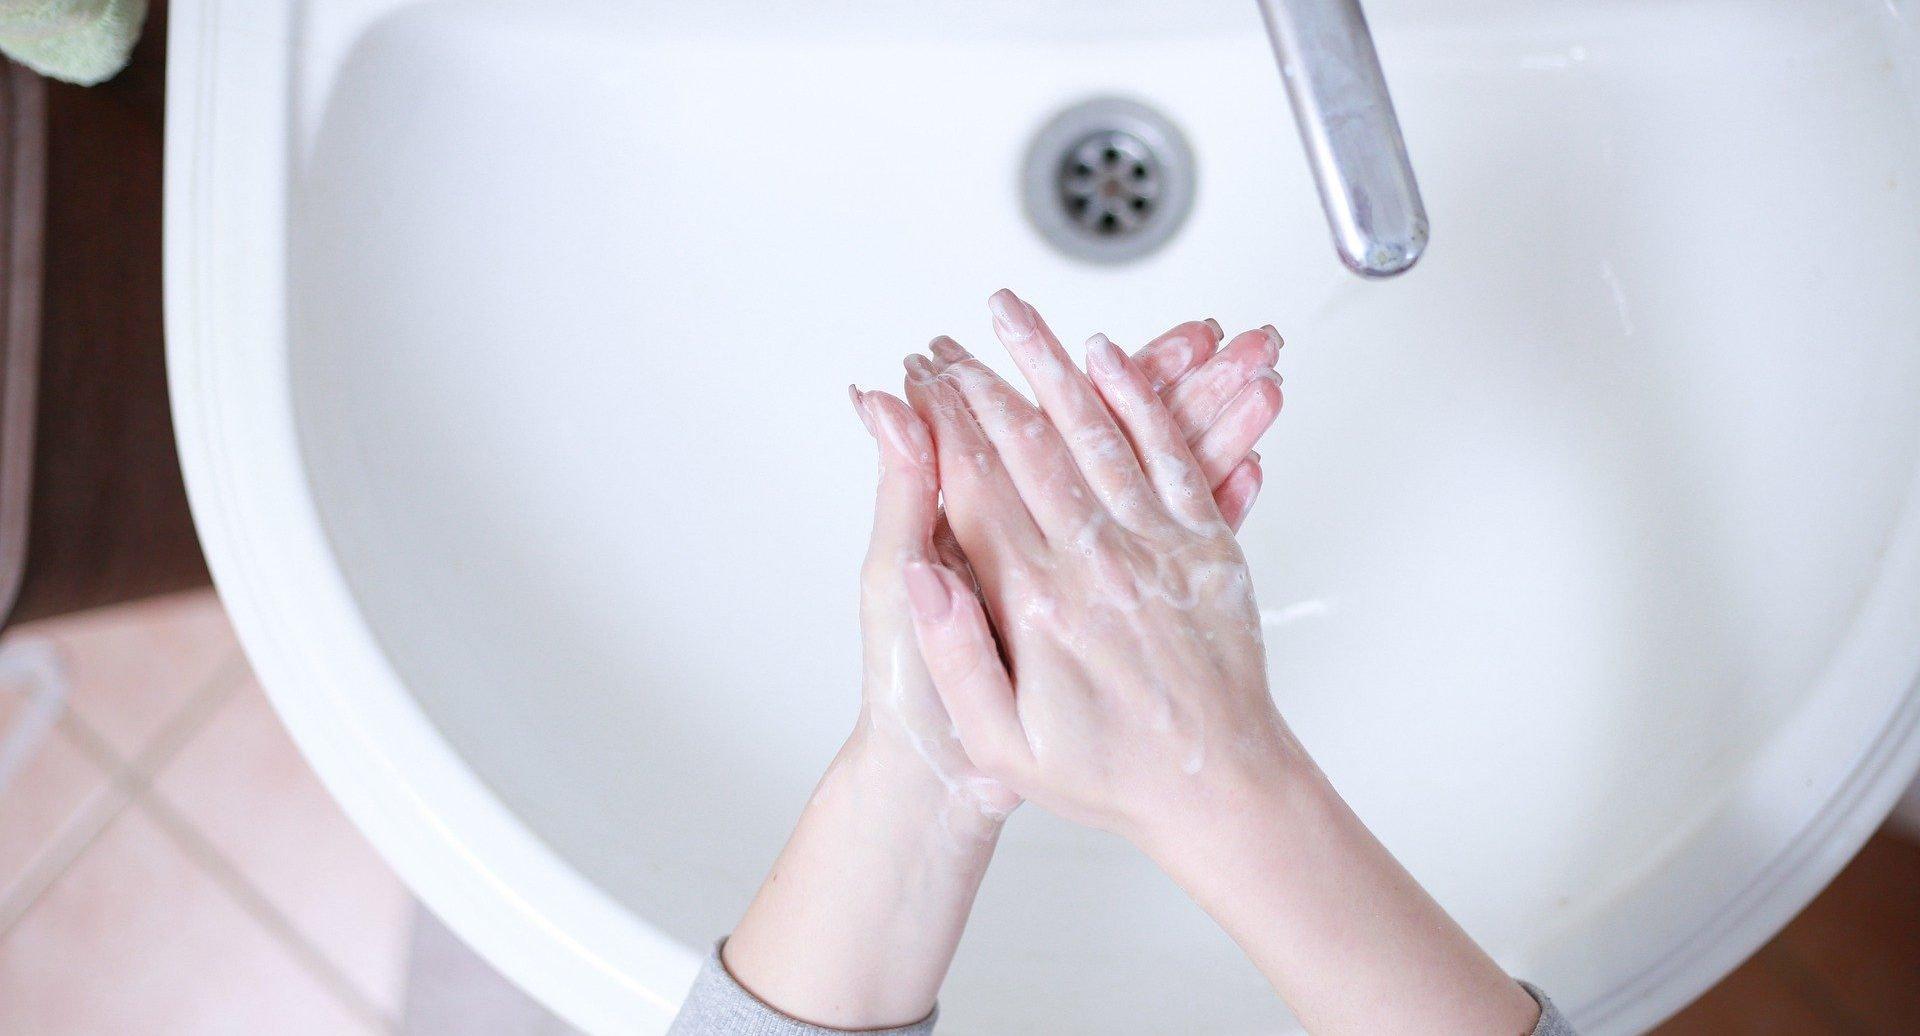 Coronavirus crisis: How to make your own hand sanitiser using three simple ingredients